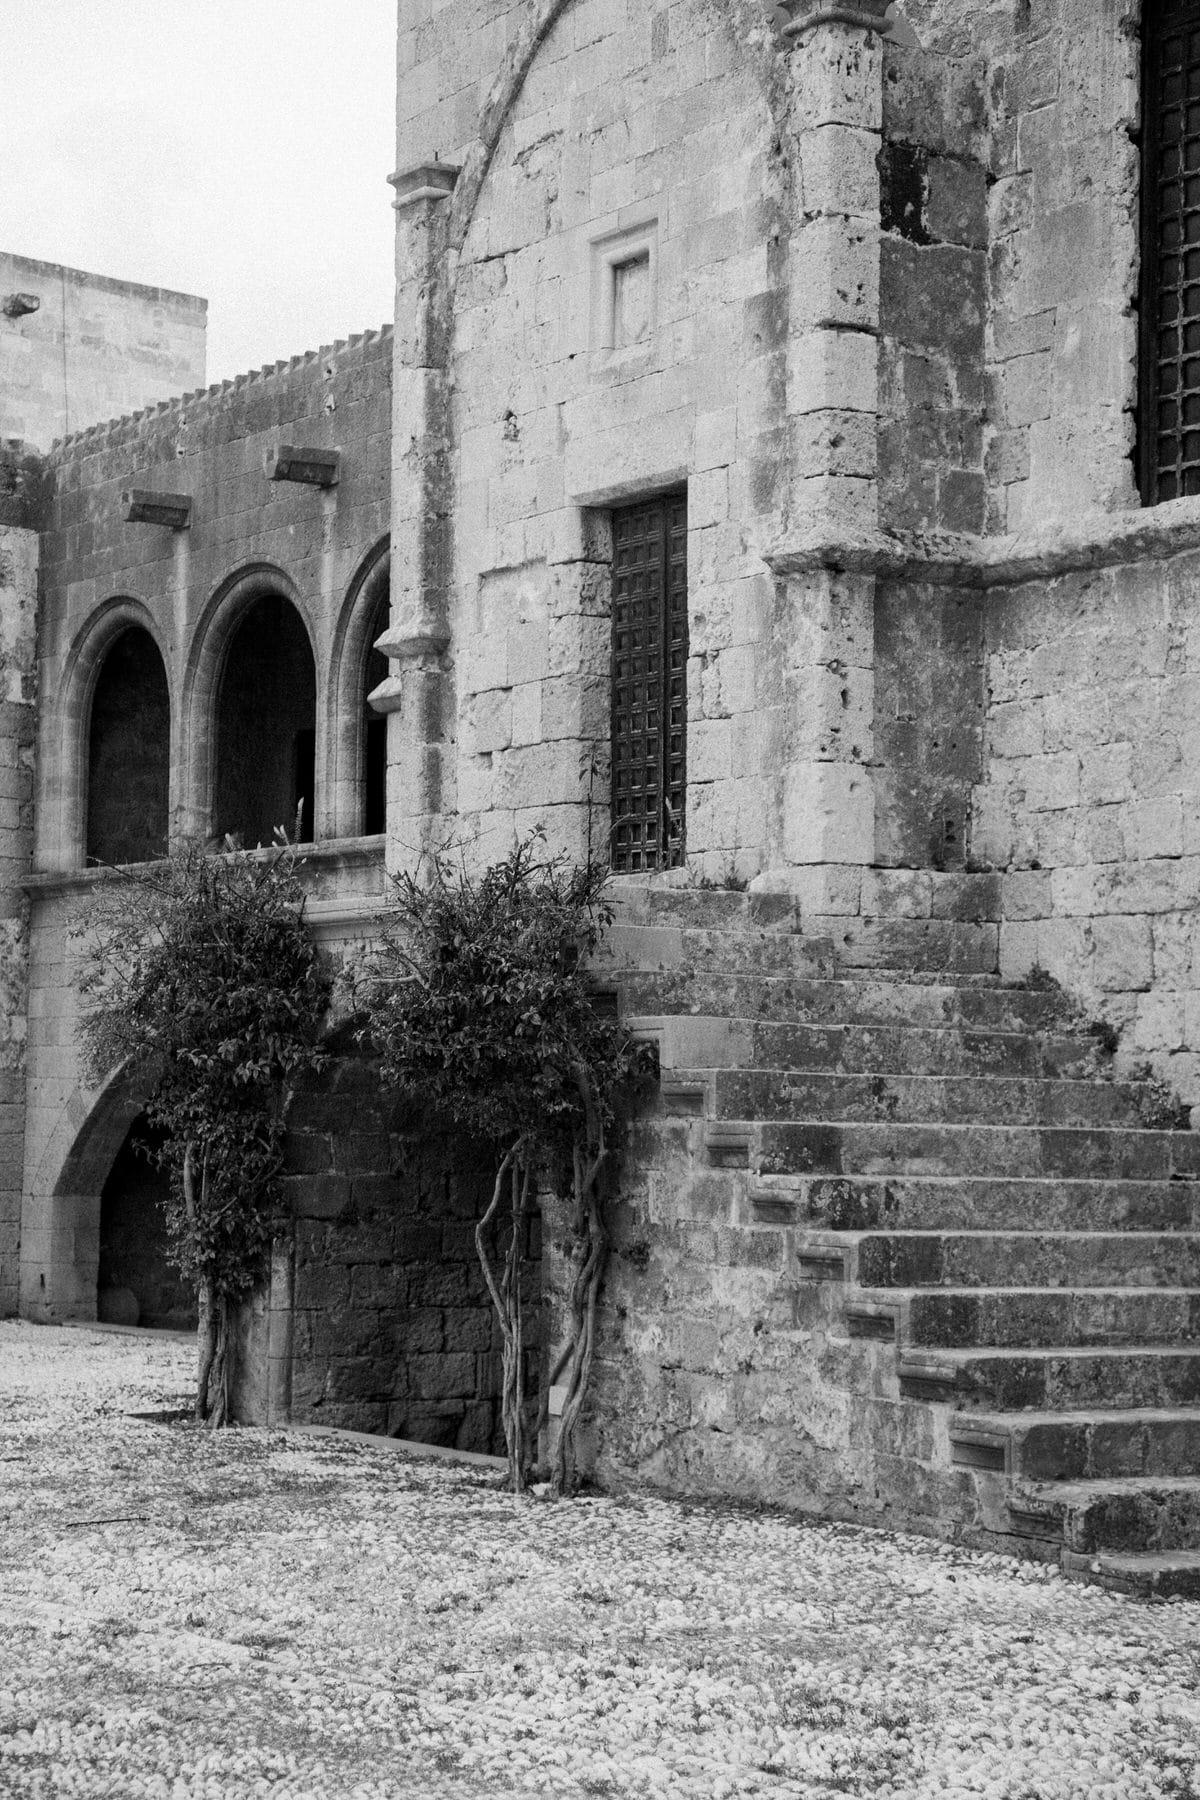 Rhodes-Greece-Island-black-and-white-fine-art-photography-by-Studio-L-photographer-Laura-Schneider-_2748